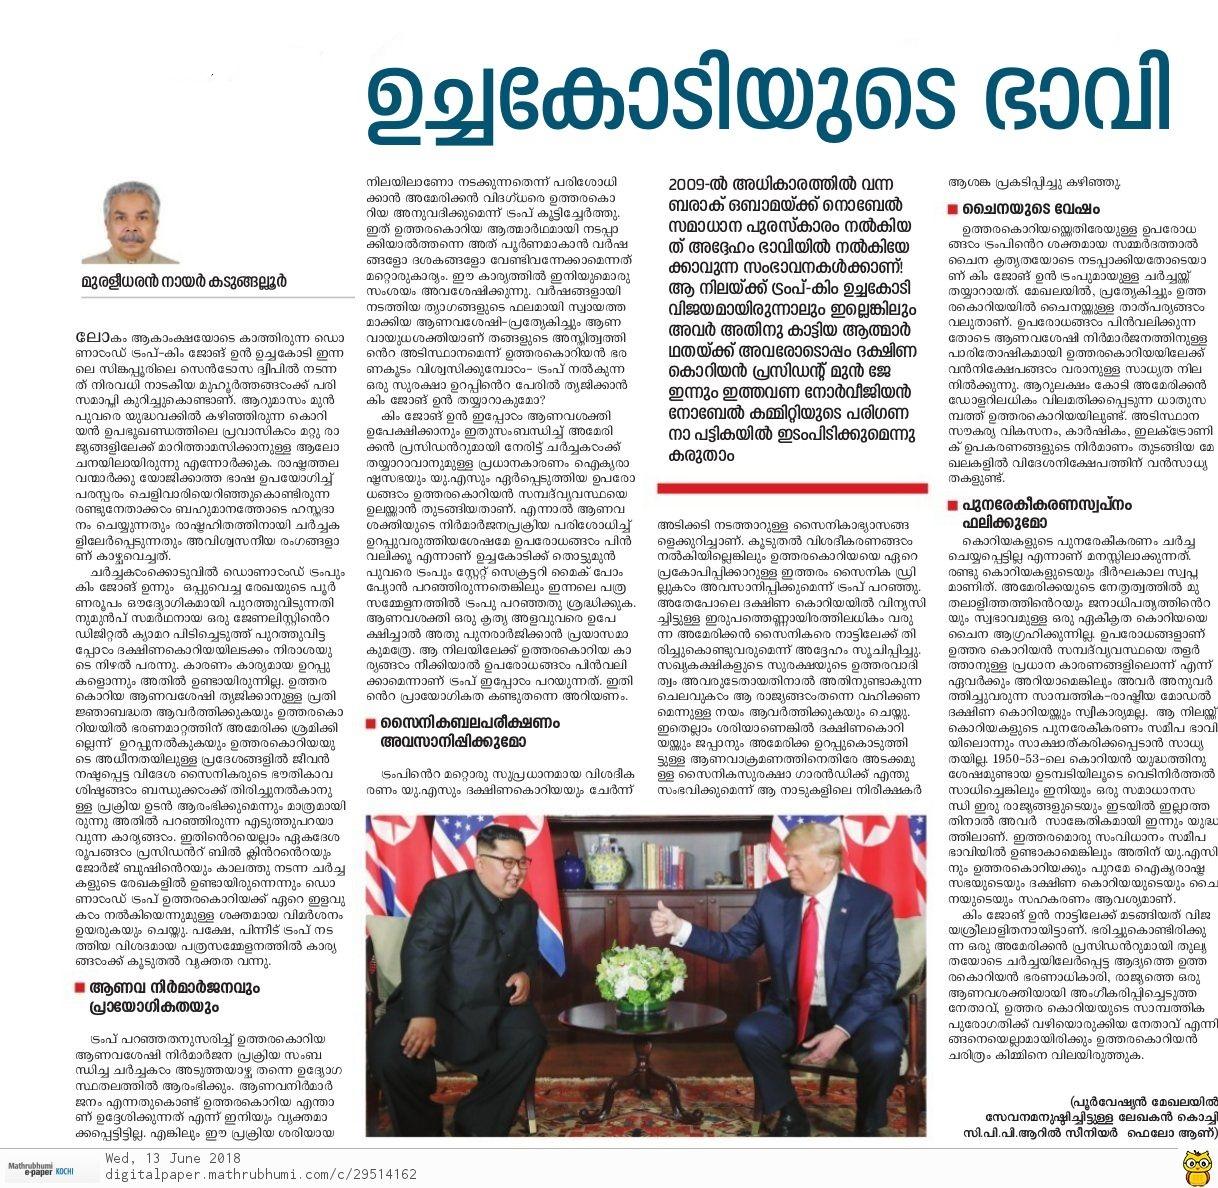 oped_Muraleedharan_CPPR_Senior Research Fellow